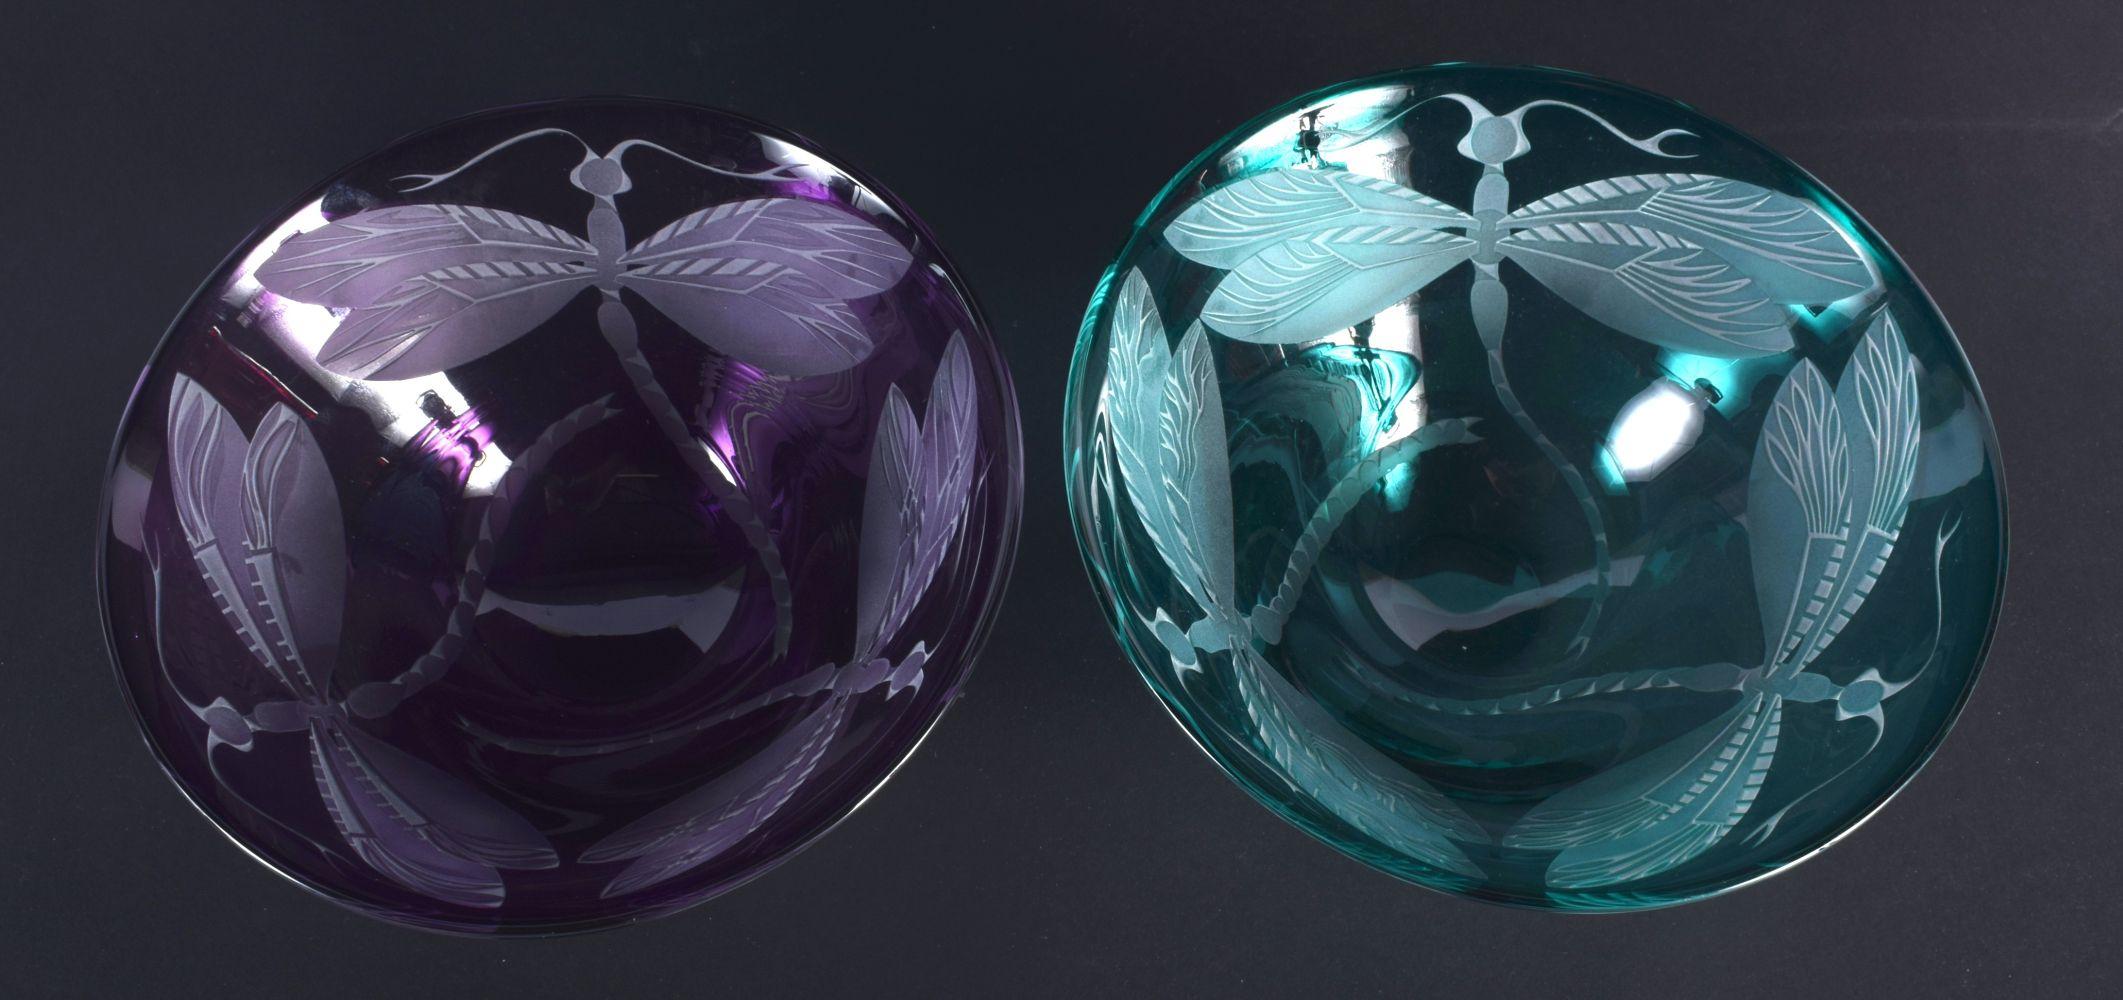 A PAIR OF CONTEMPORARY ART GLASS DRAGONFLY BOWLS. 13 cm diameter. - Image 2 of 3